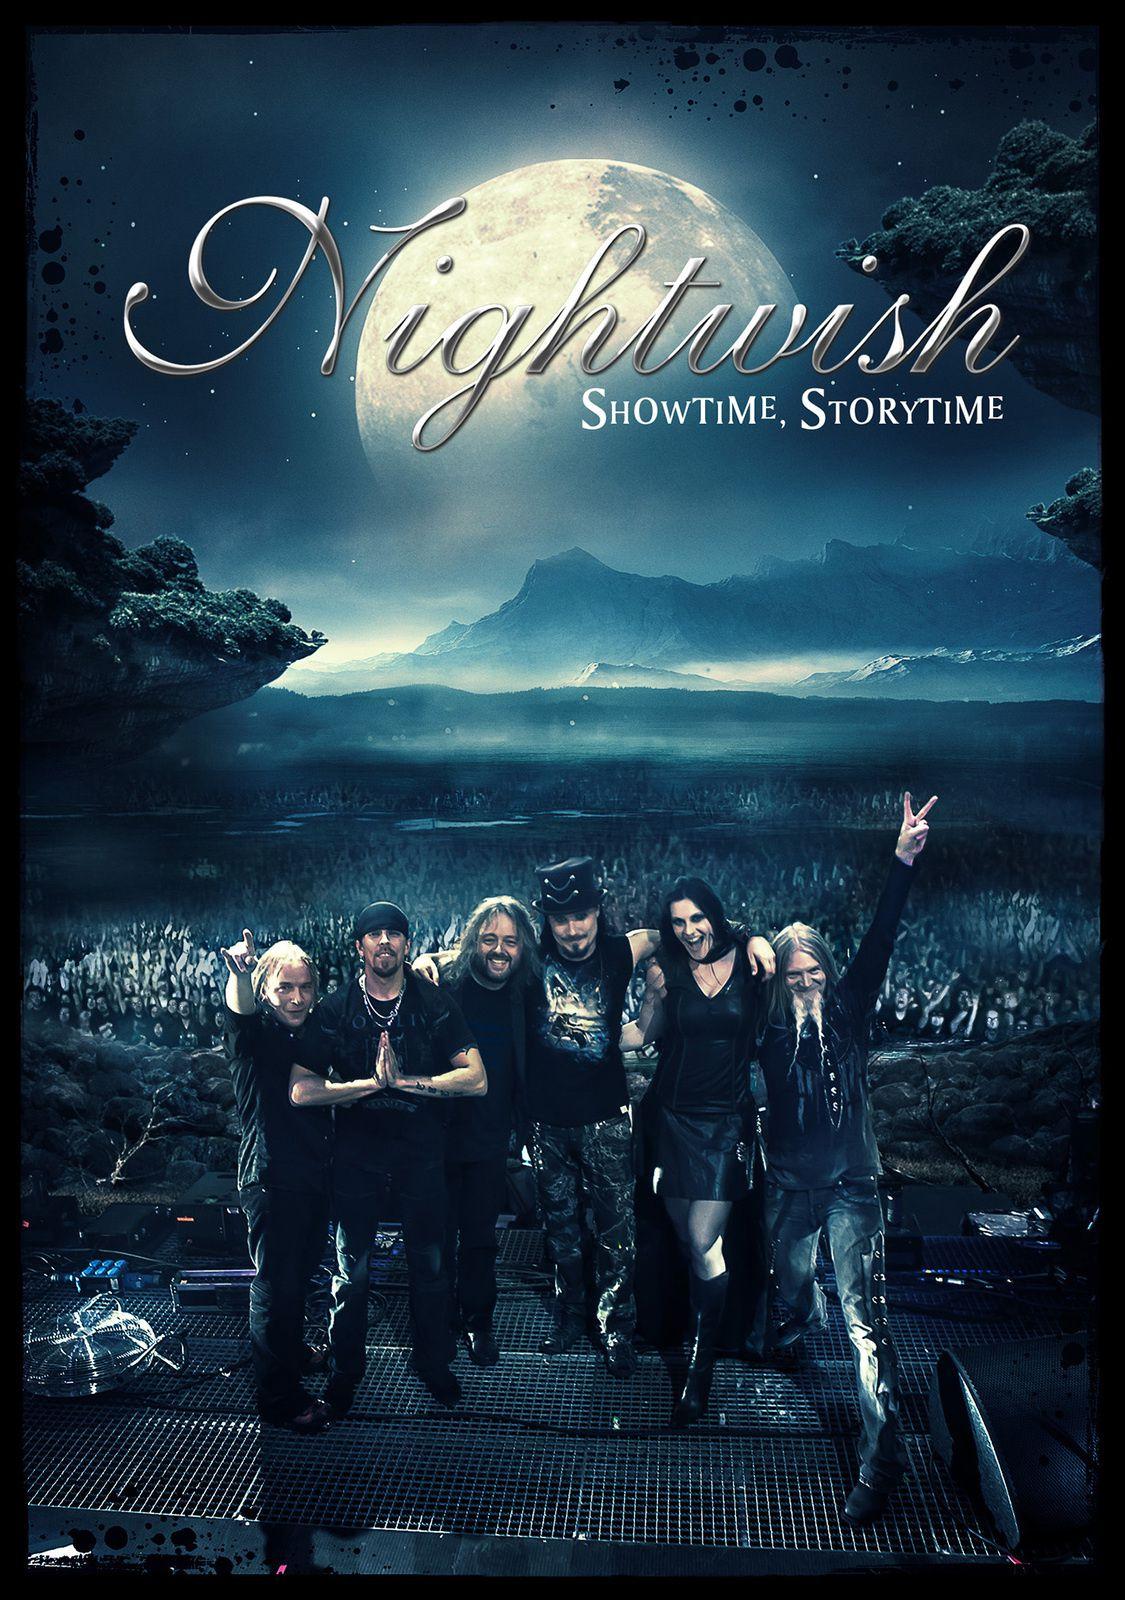 New NIGHTWISH video from Wacken in 2013